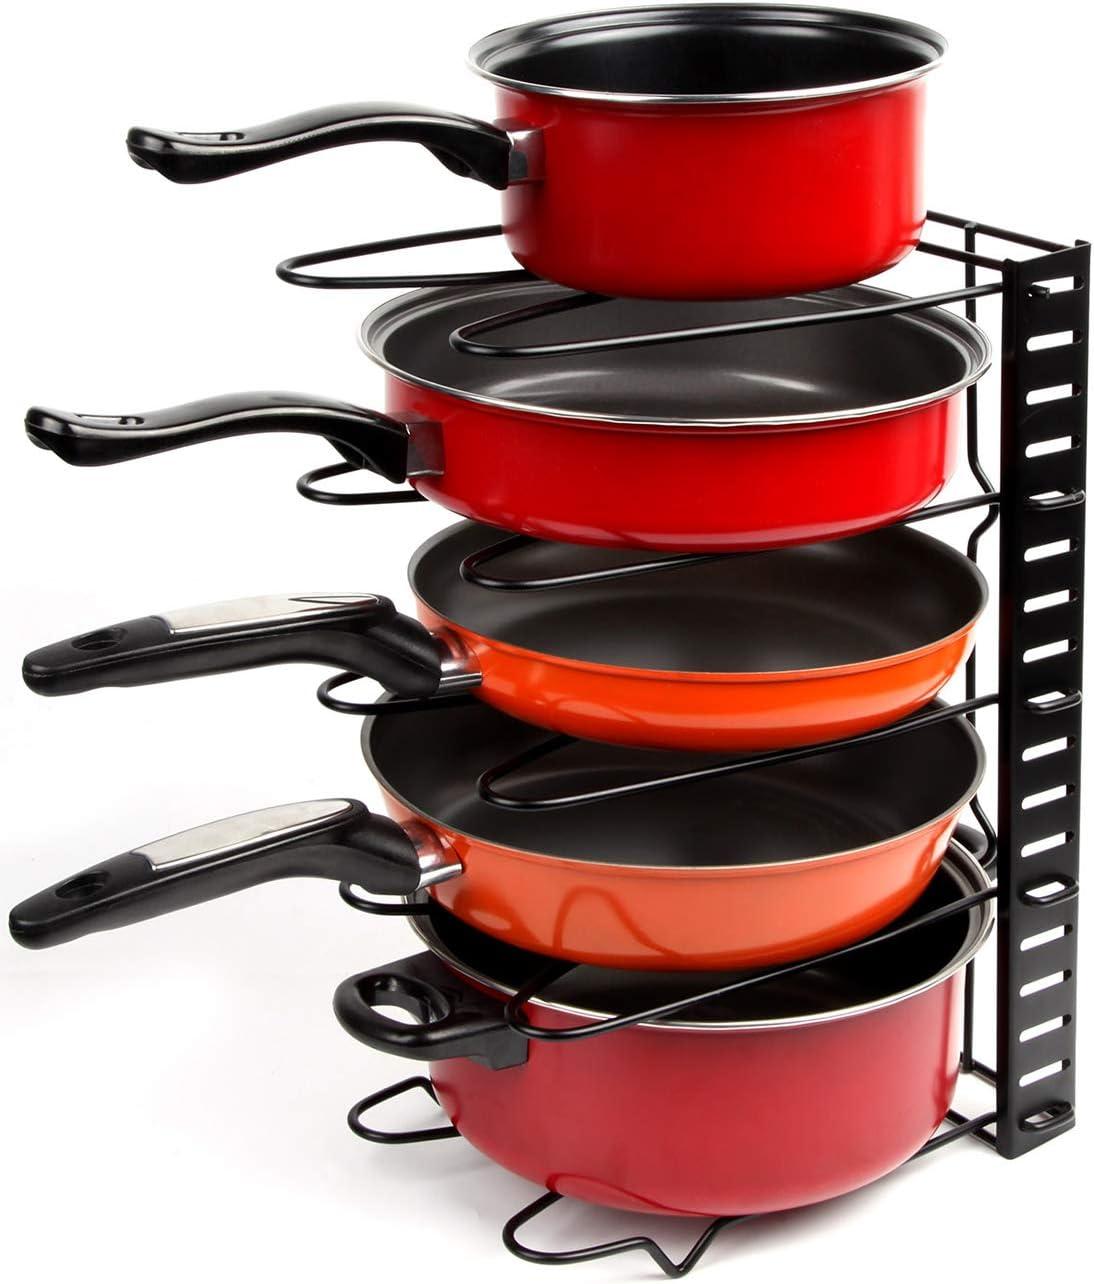 Height Adjustable Pan Organizer Rack, VDOMUS Pan and Pot Lid Holder Black Metal (Black): Home Improvement